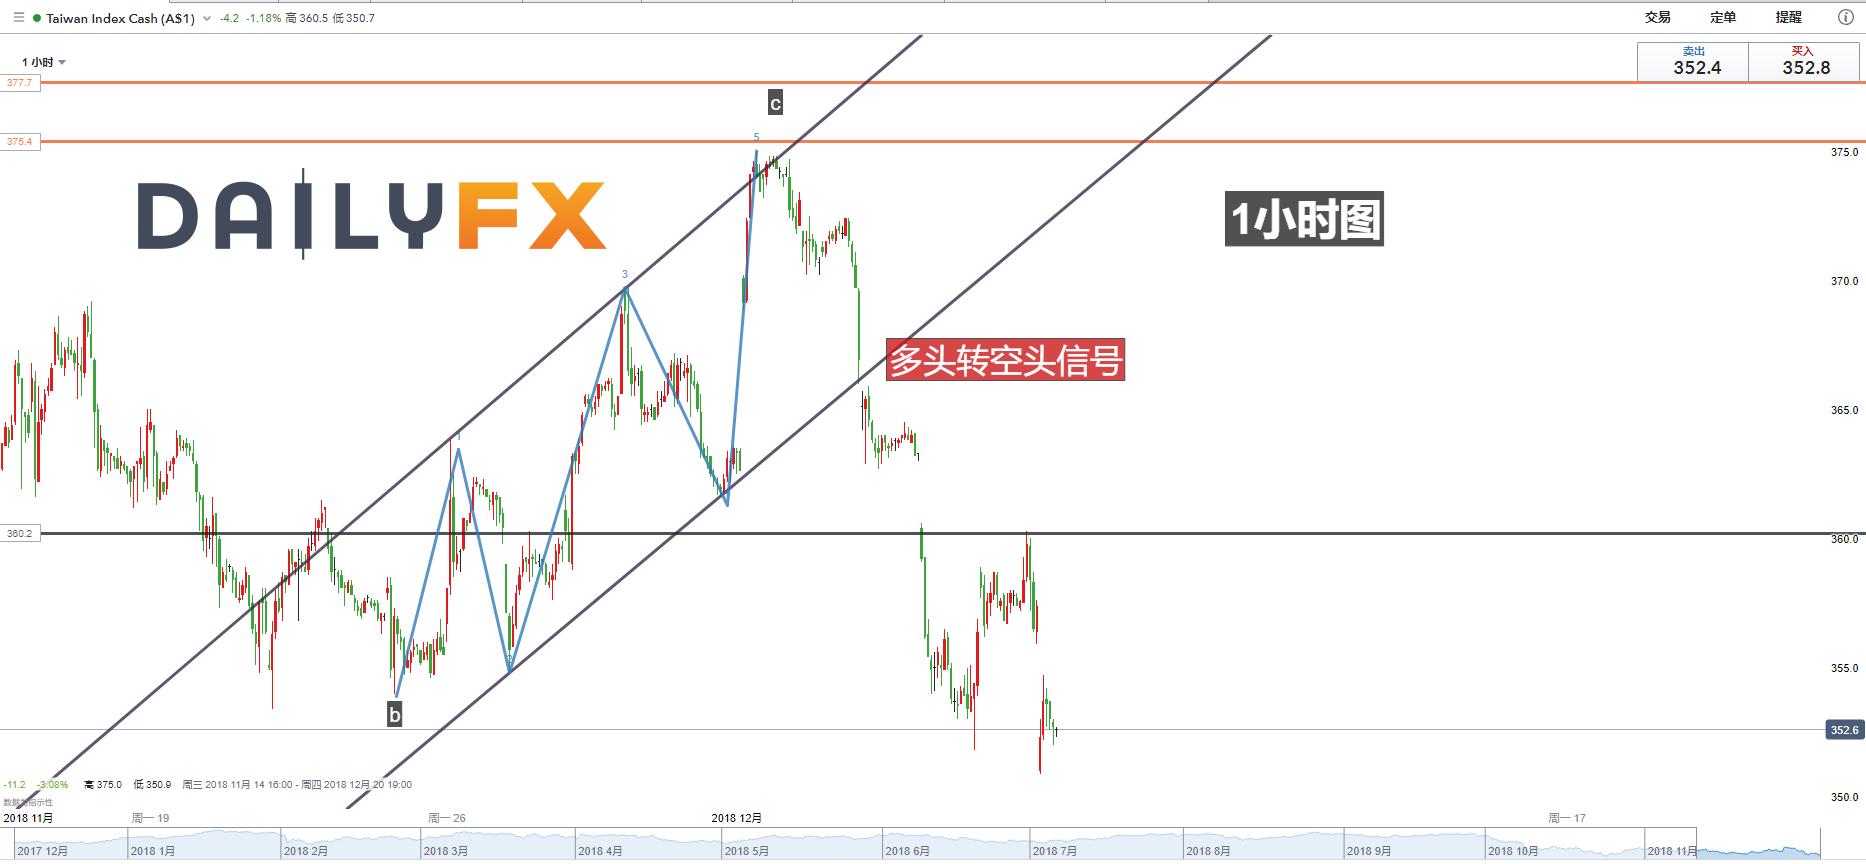 MSCI台灣指數分析:從艾略特波浪角度看,台灣股指恐迎來新的一輪下跌